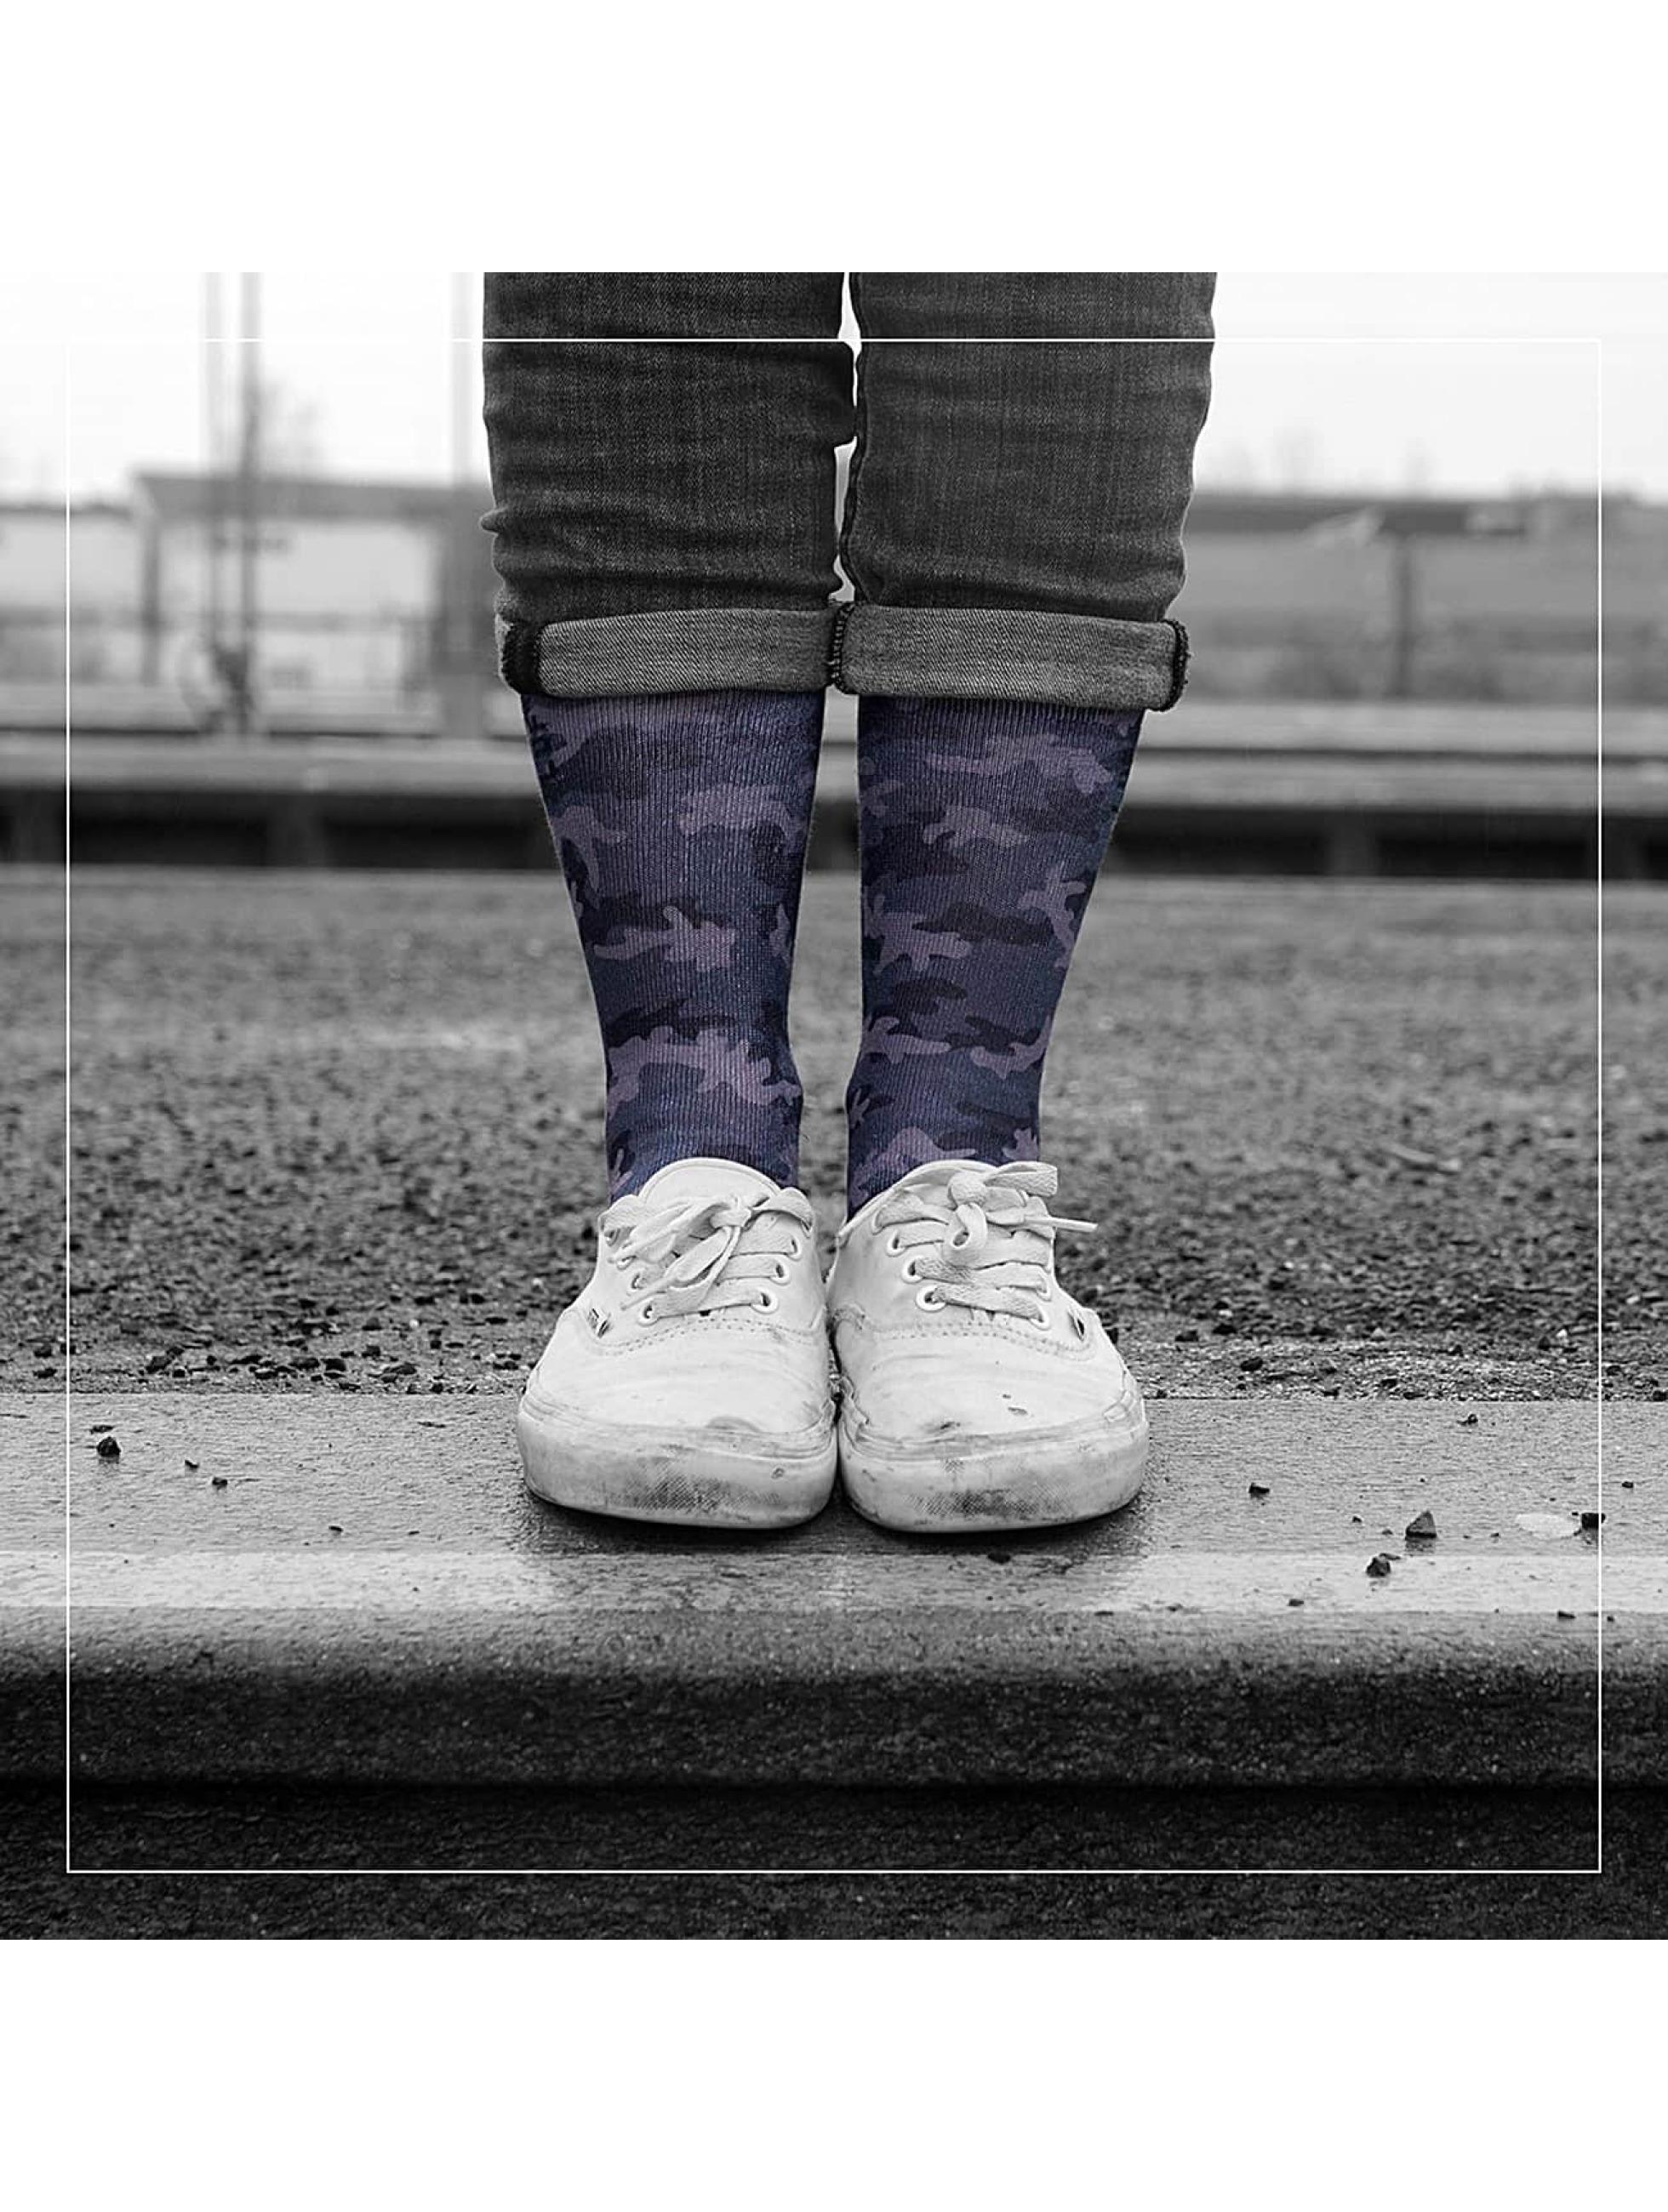 LUF SOX Socks Camo Ash camouflage